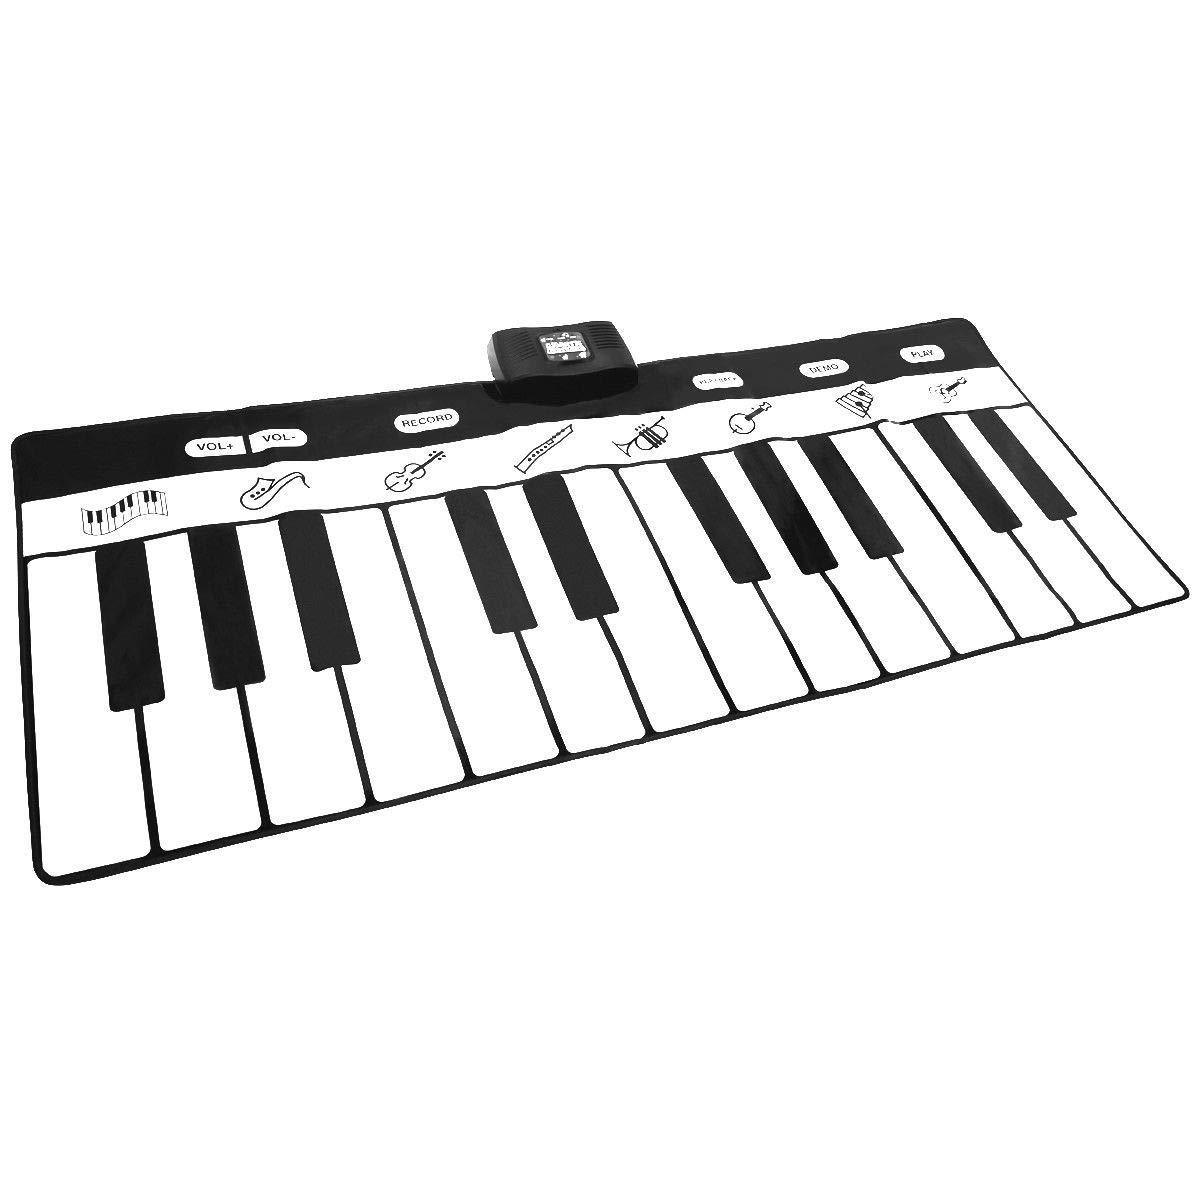 FDInspiration 71'' Kids 24-Key Keyboard Dance Gigantic Piano Playmat w/ 4 Modes with Ebook by FDInspiration (Image #1)